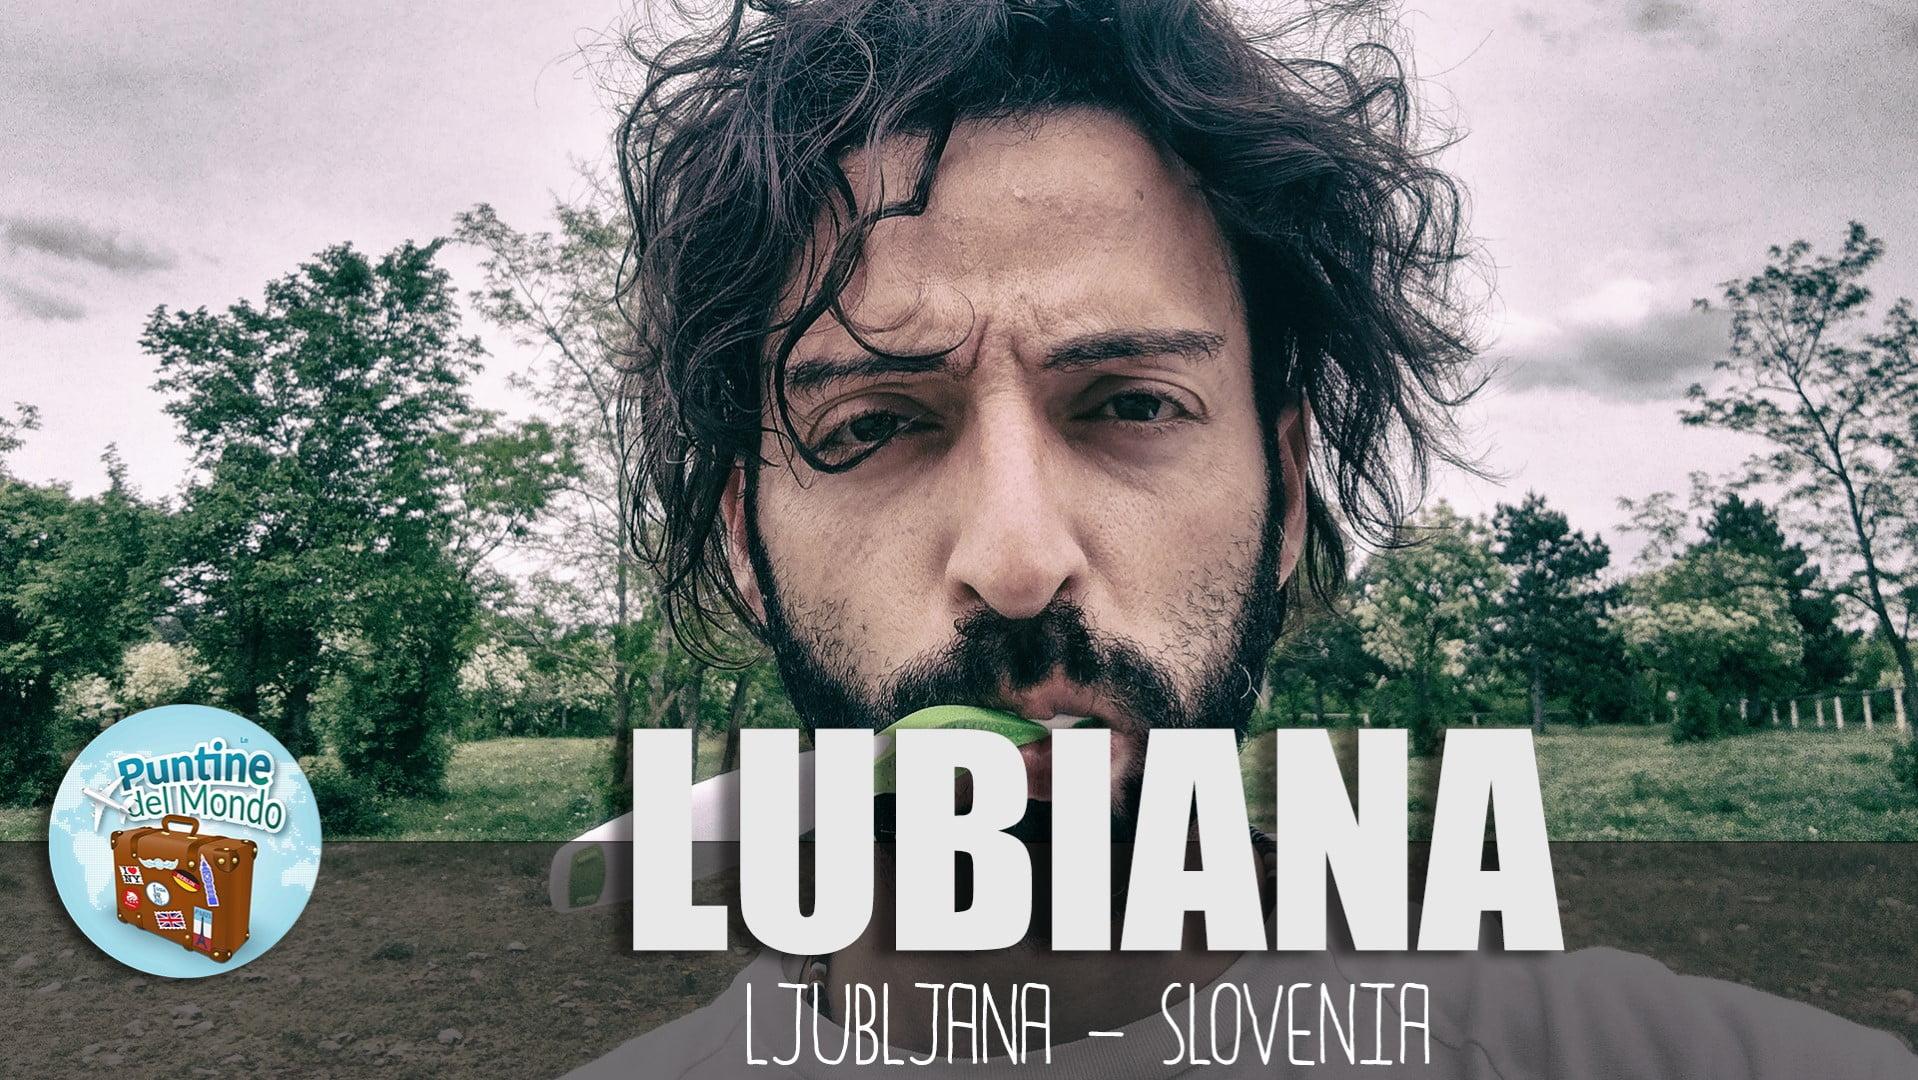 Ljubljana Lubiana (Slovenia)